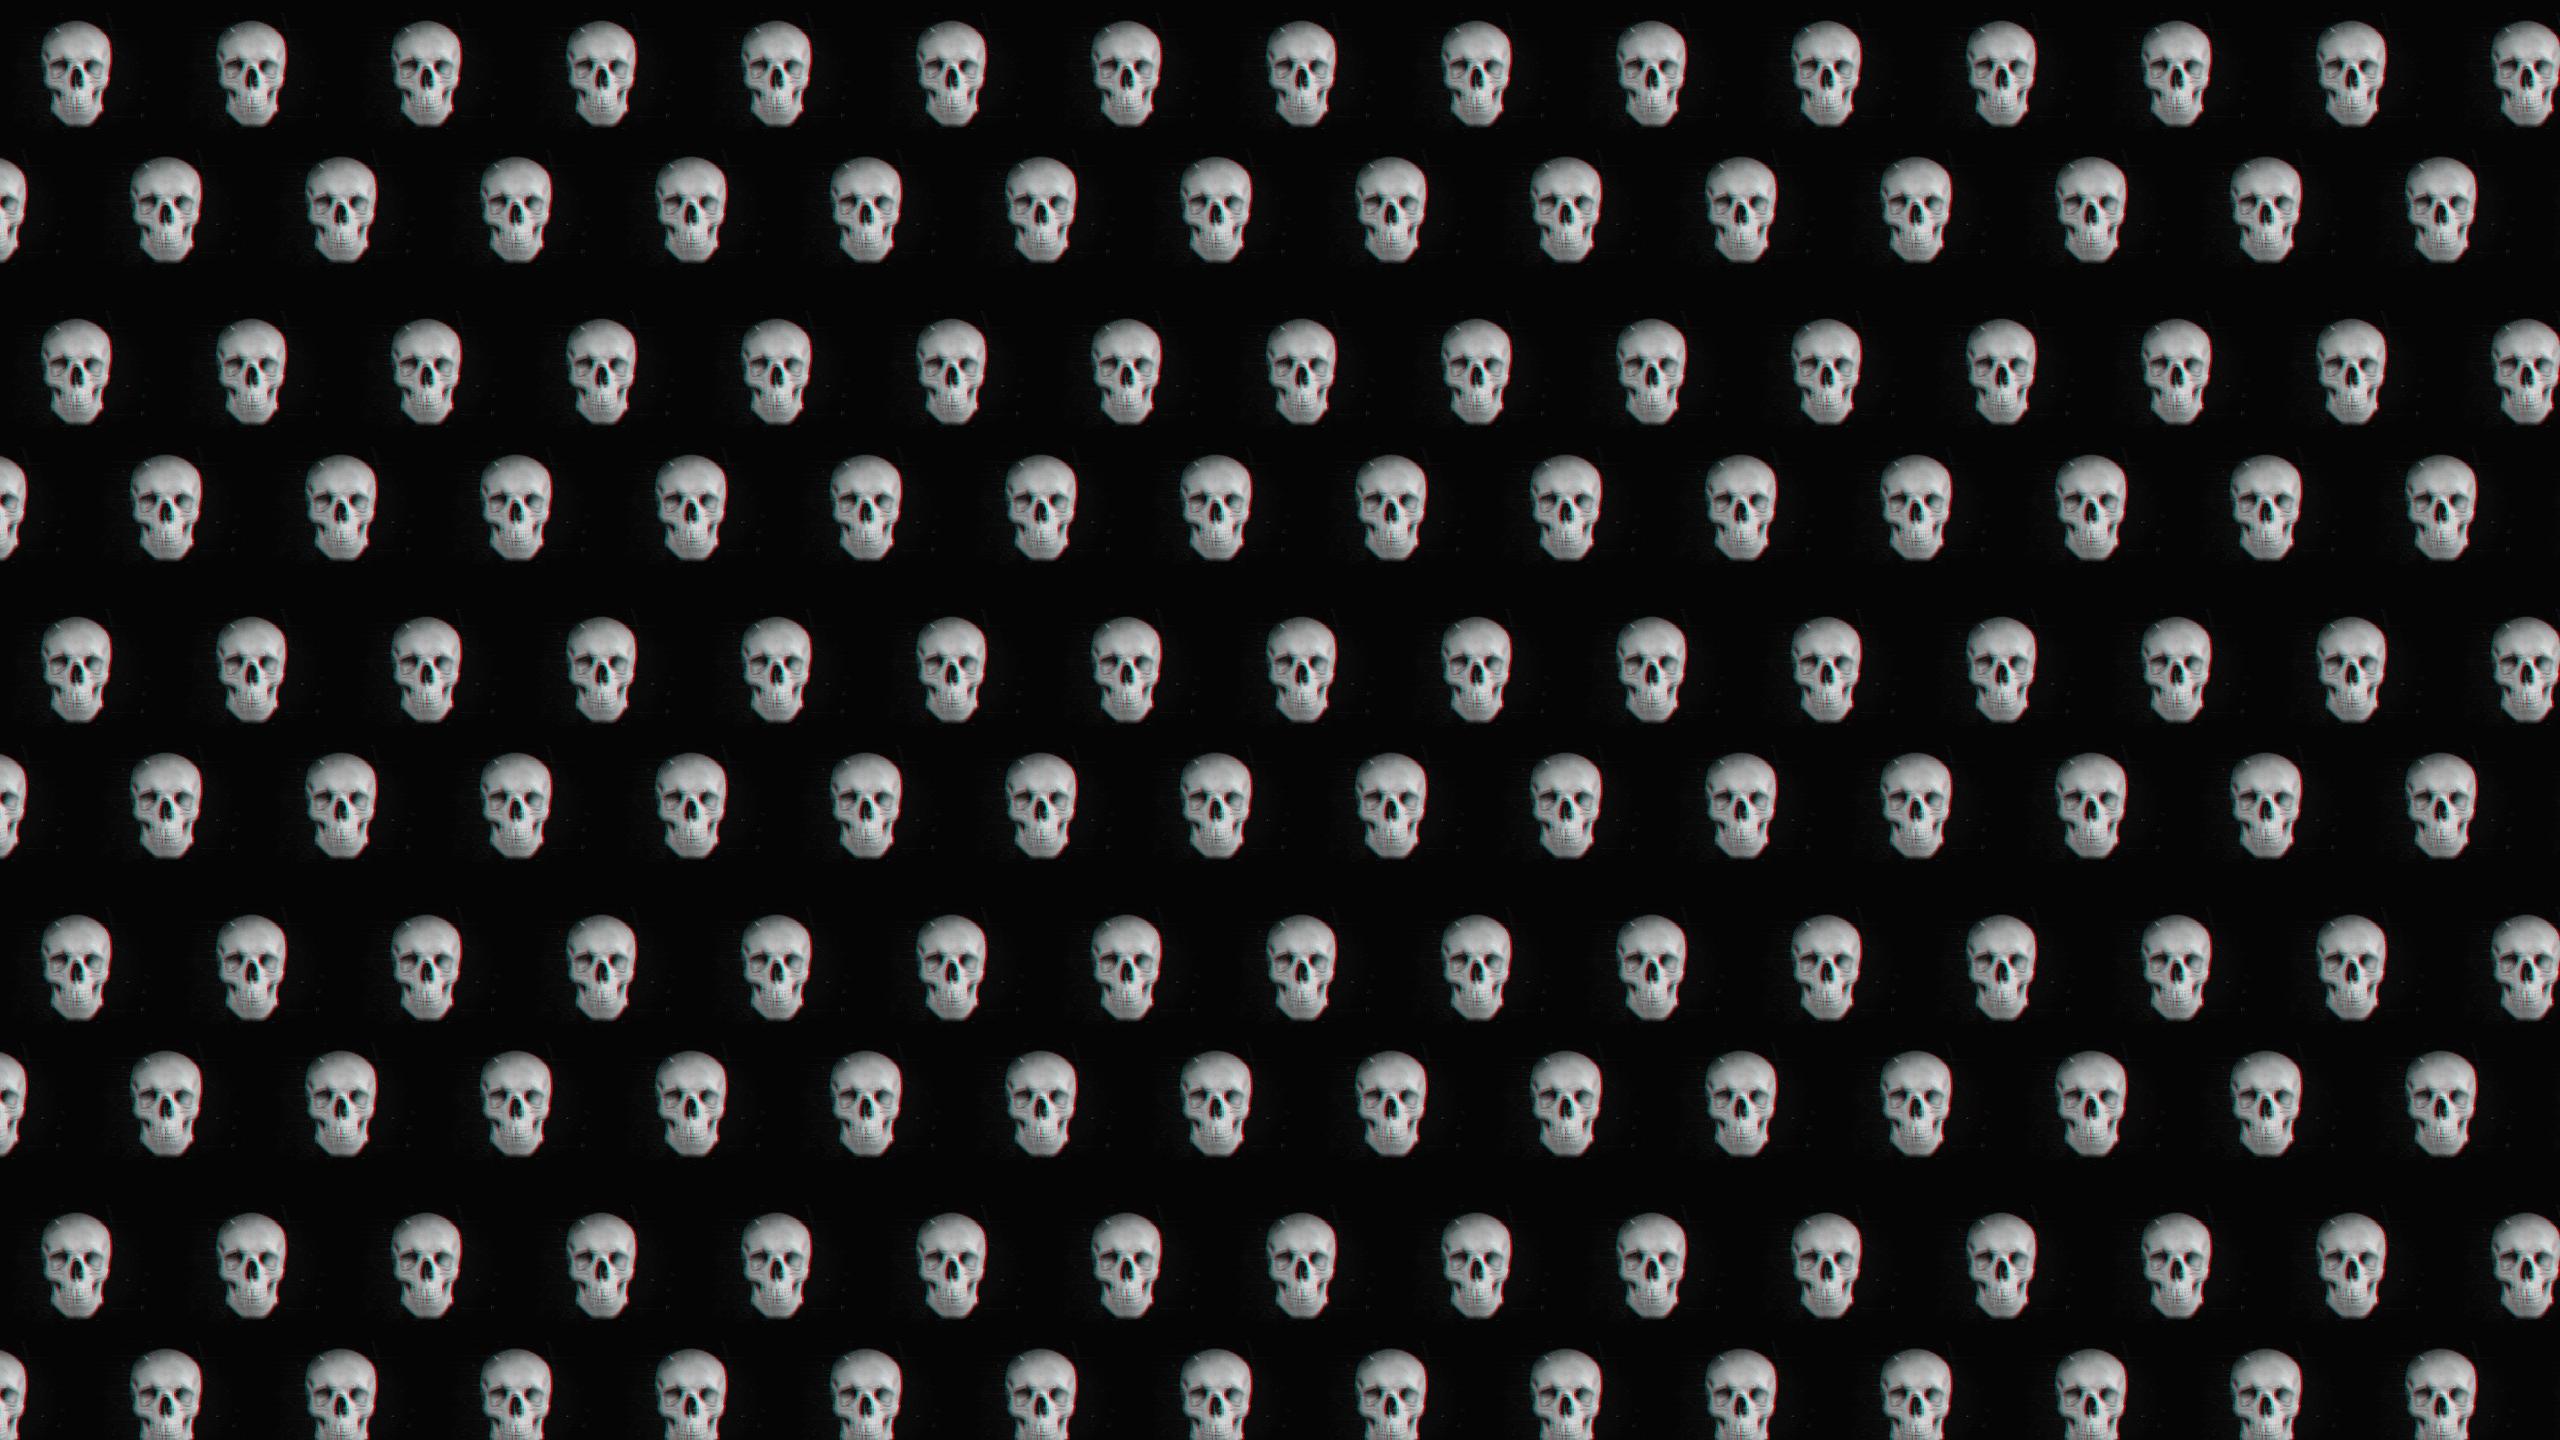 this 3d Skulls Desktop Wallpaper is easy Just save the wallpaper 2560x1440